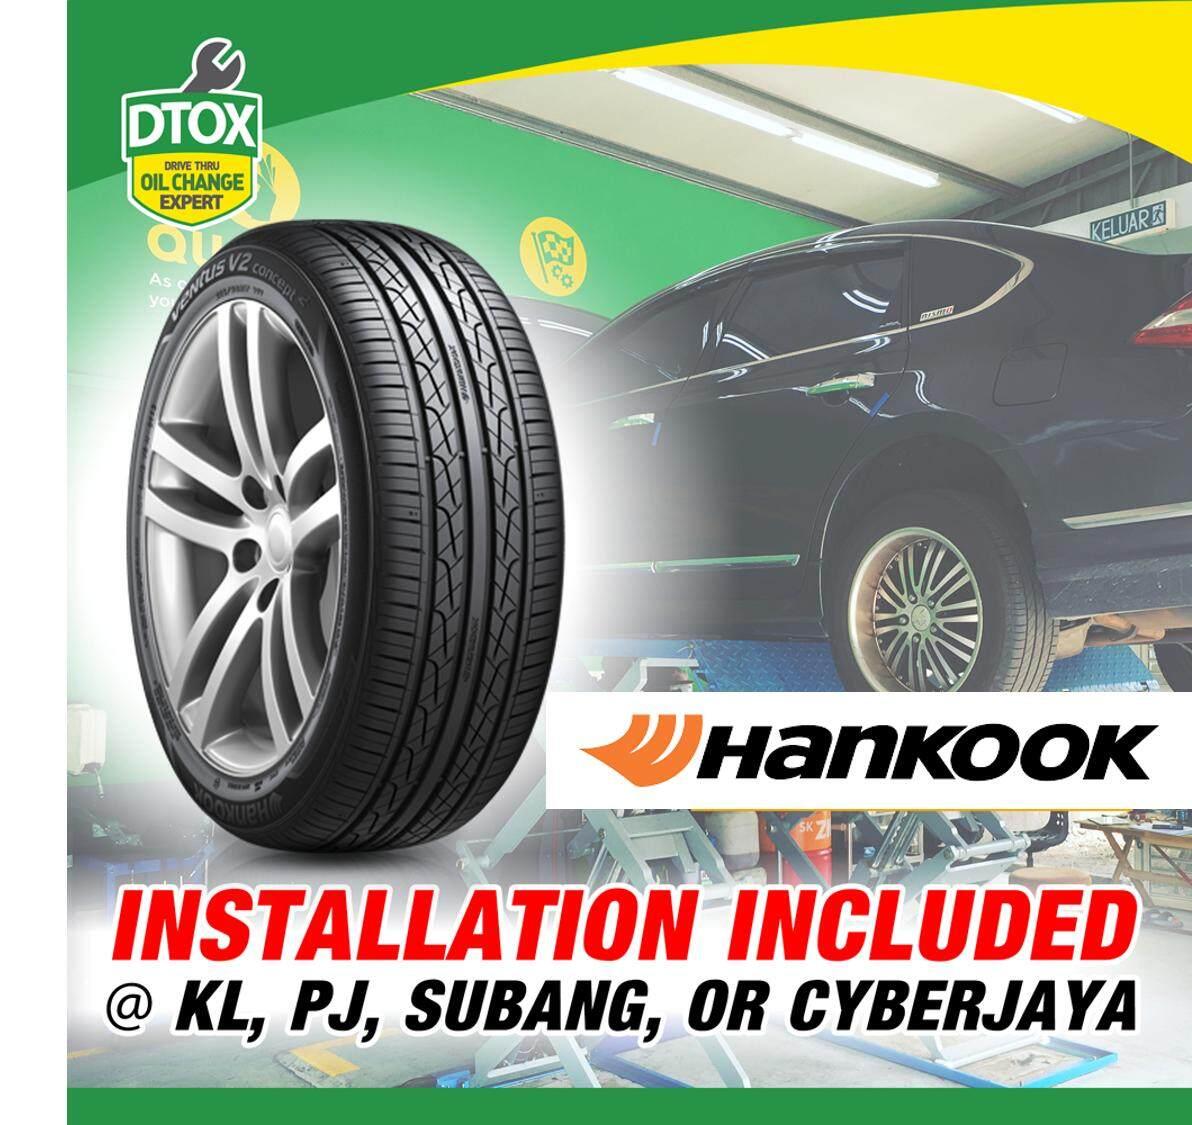 Hankook Ventus V2 (H457) 215/50R17 Tyres (with installation)